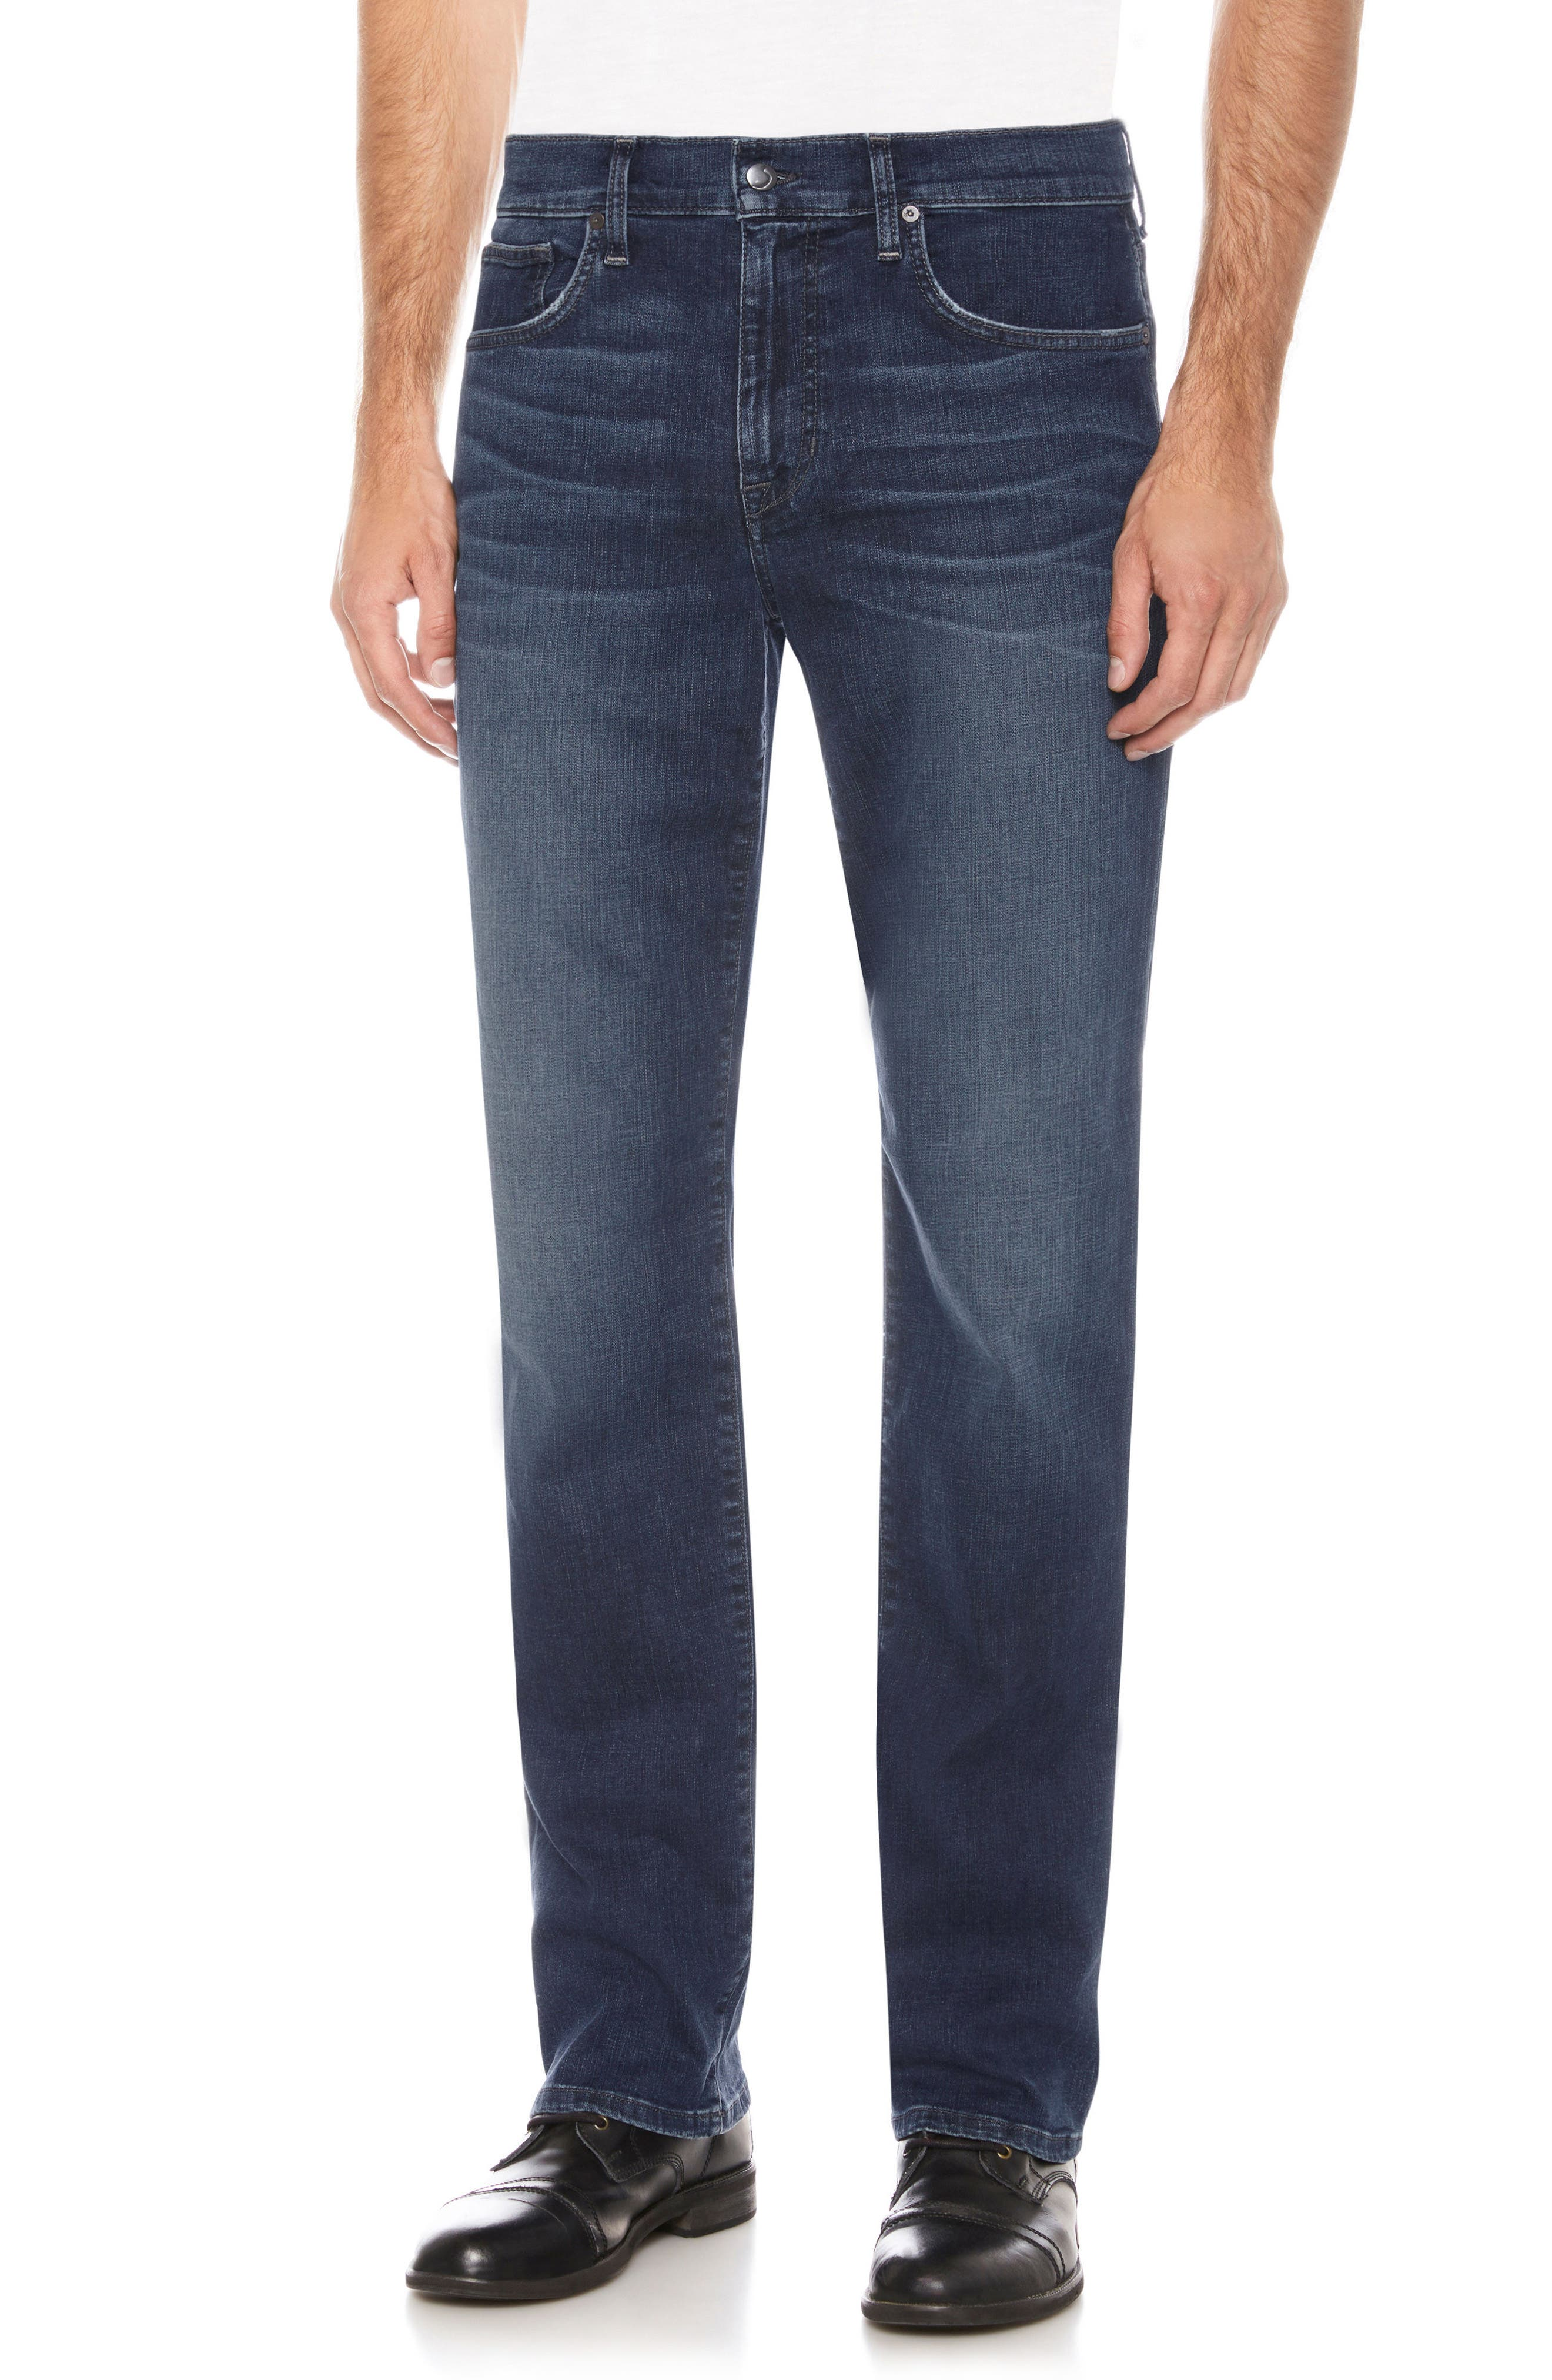 Joe's Classic Straight Fit Jeans (Belding)